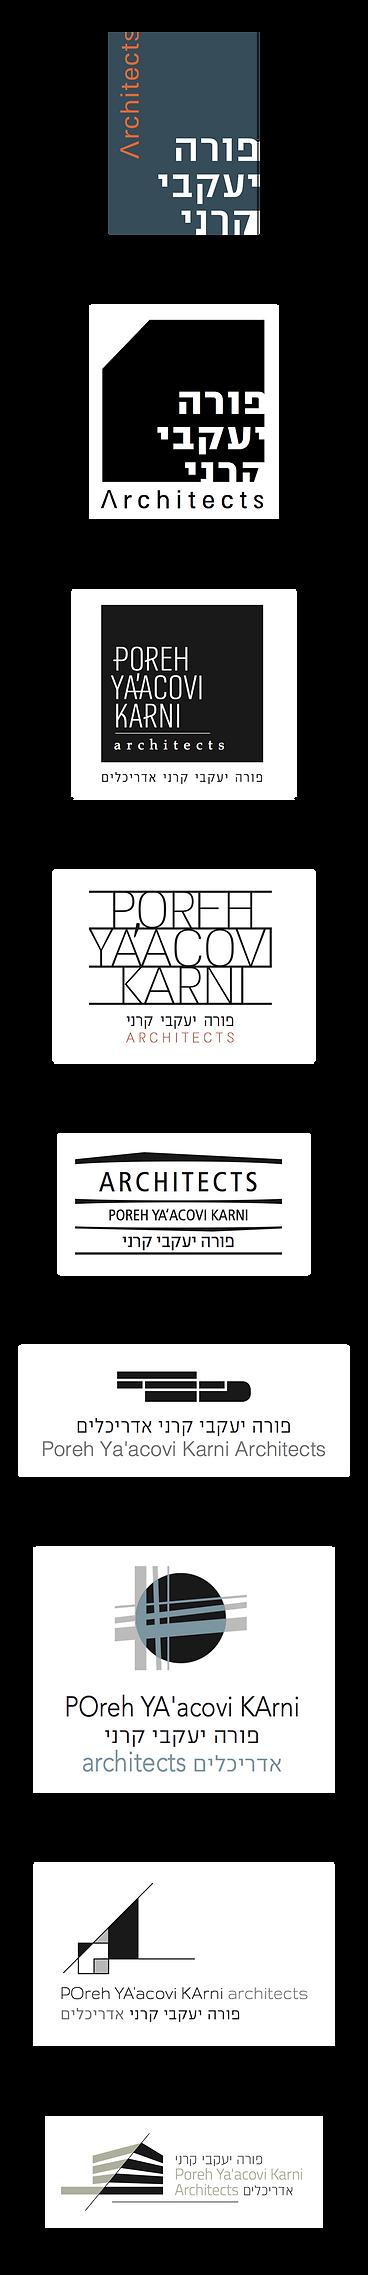 logo_obli.png